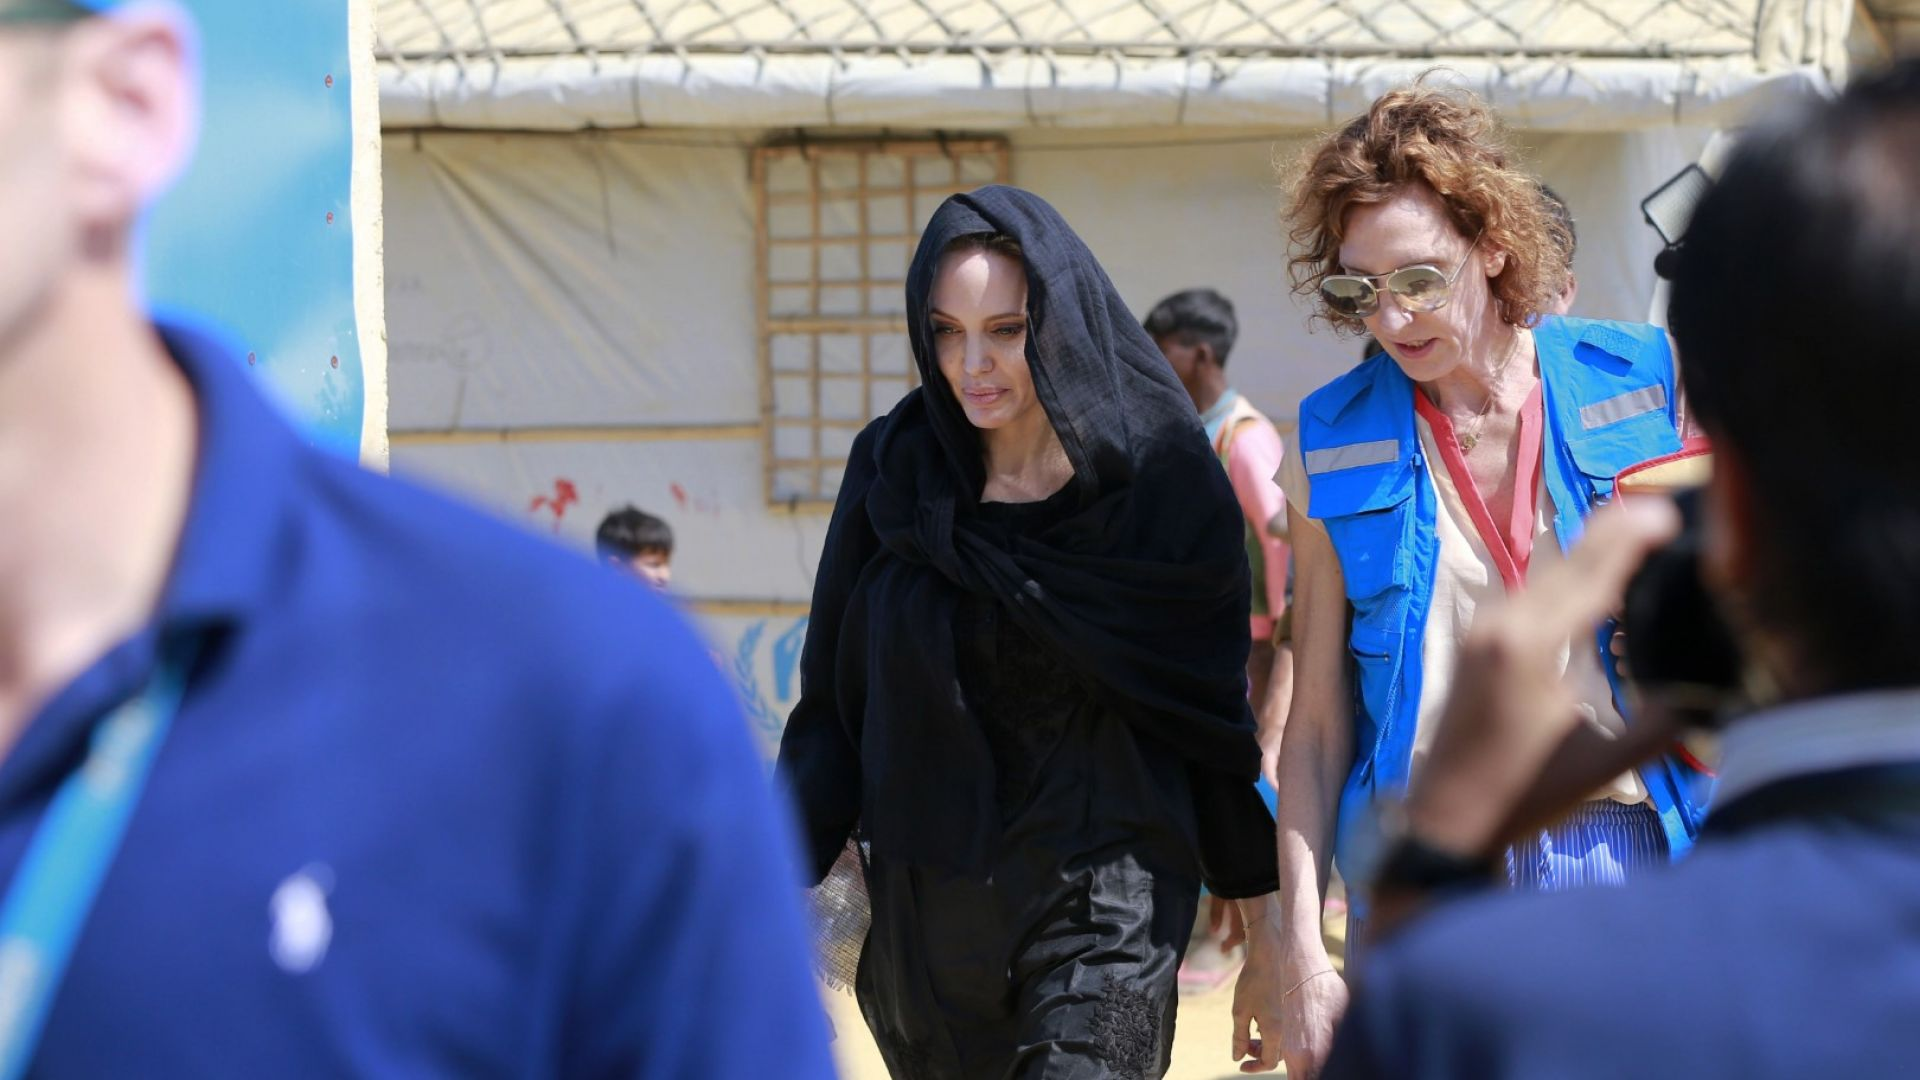 Анджелина Джоли посети най-големия бежански лагер в света